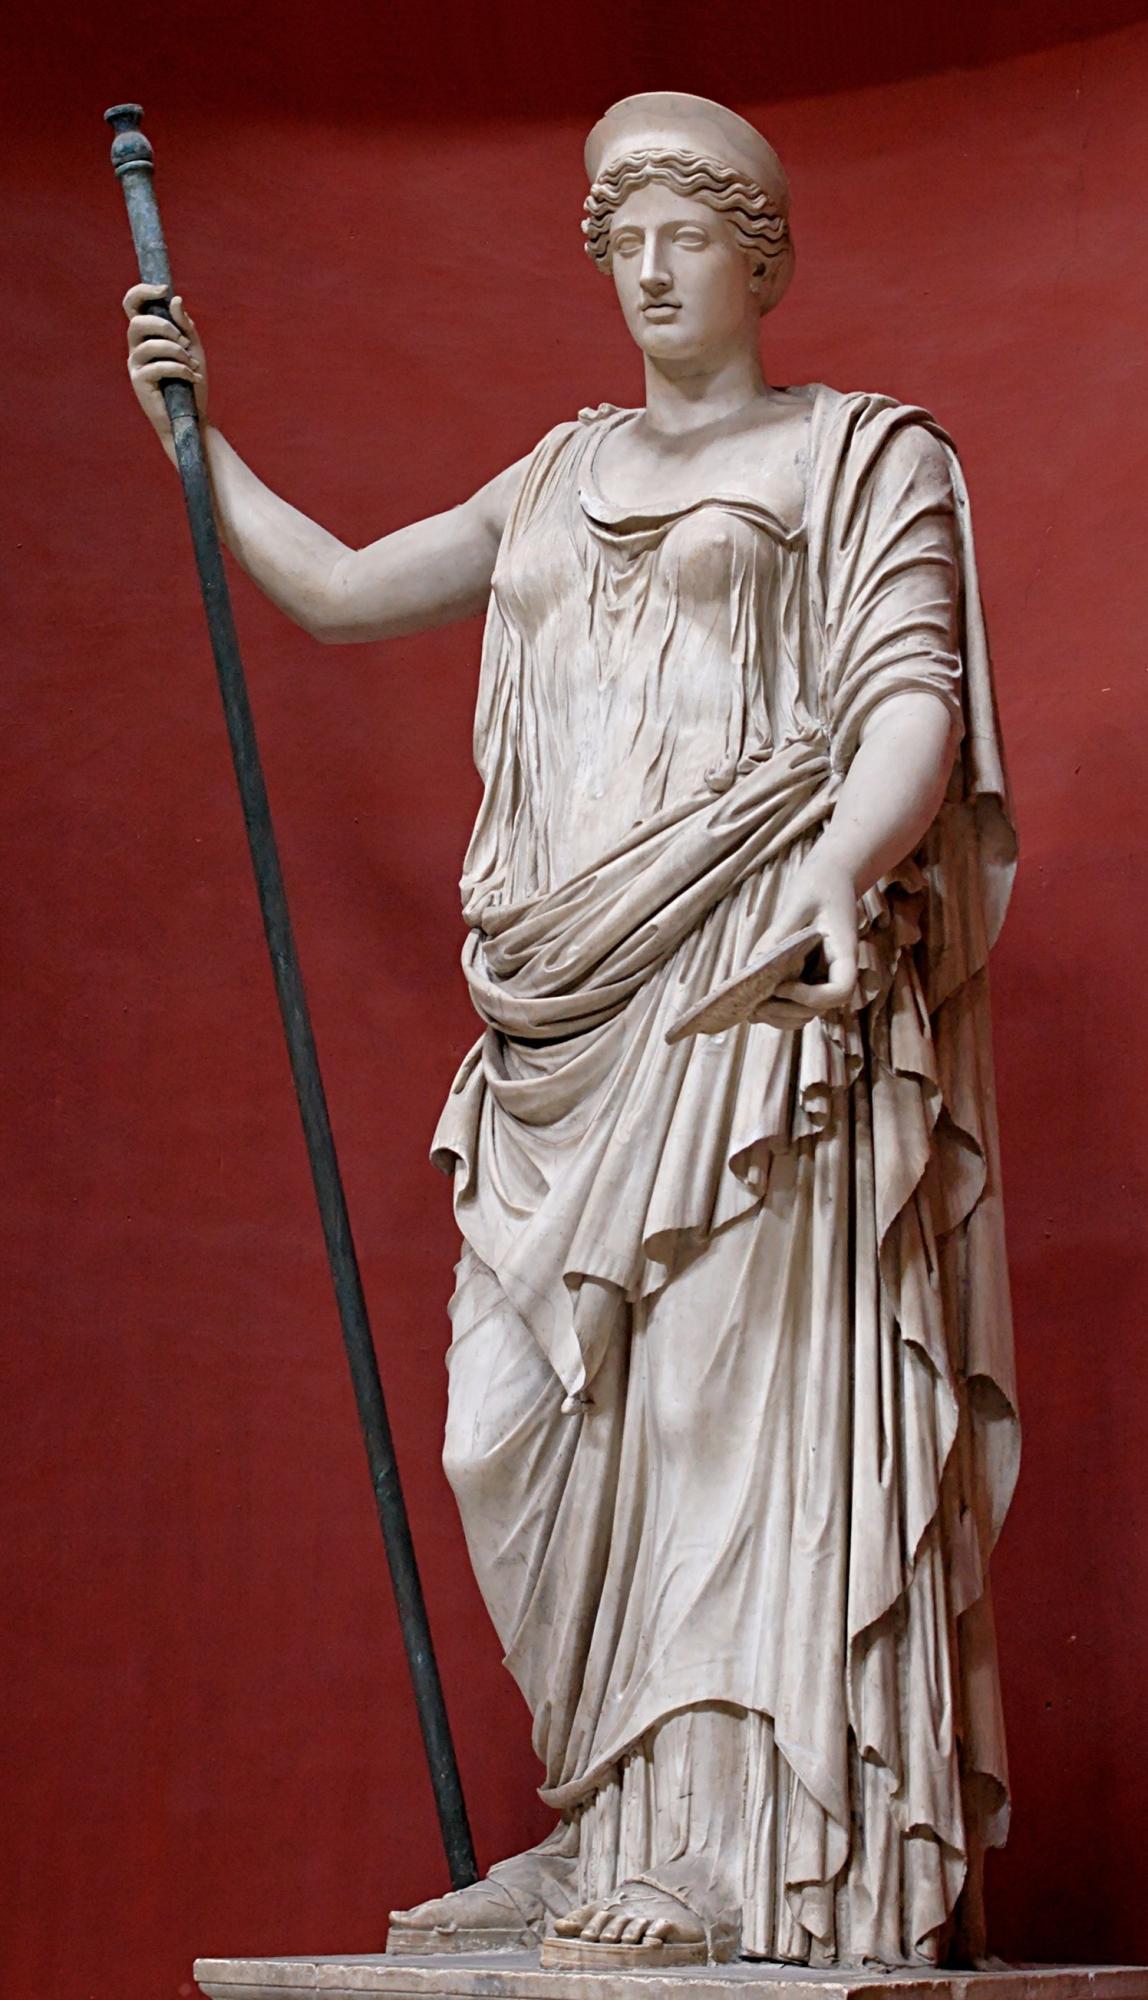 The Olympian Gods: legendary Greek and Roman gods